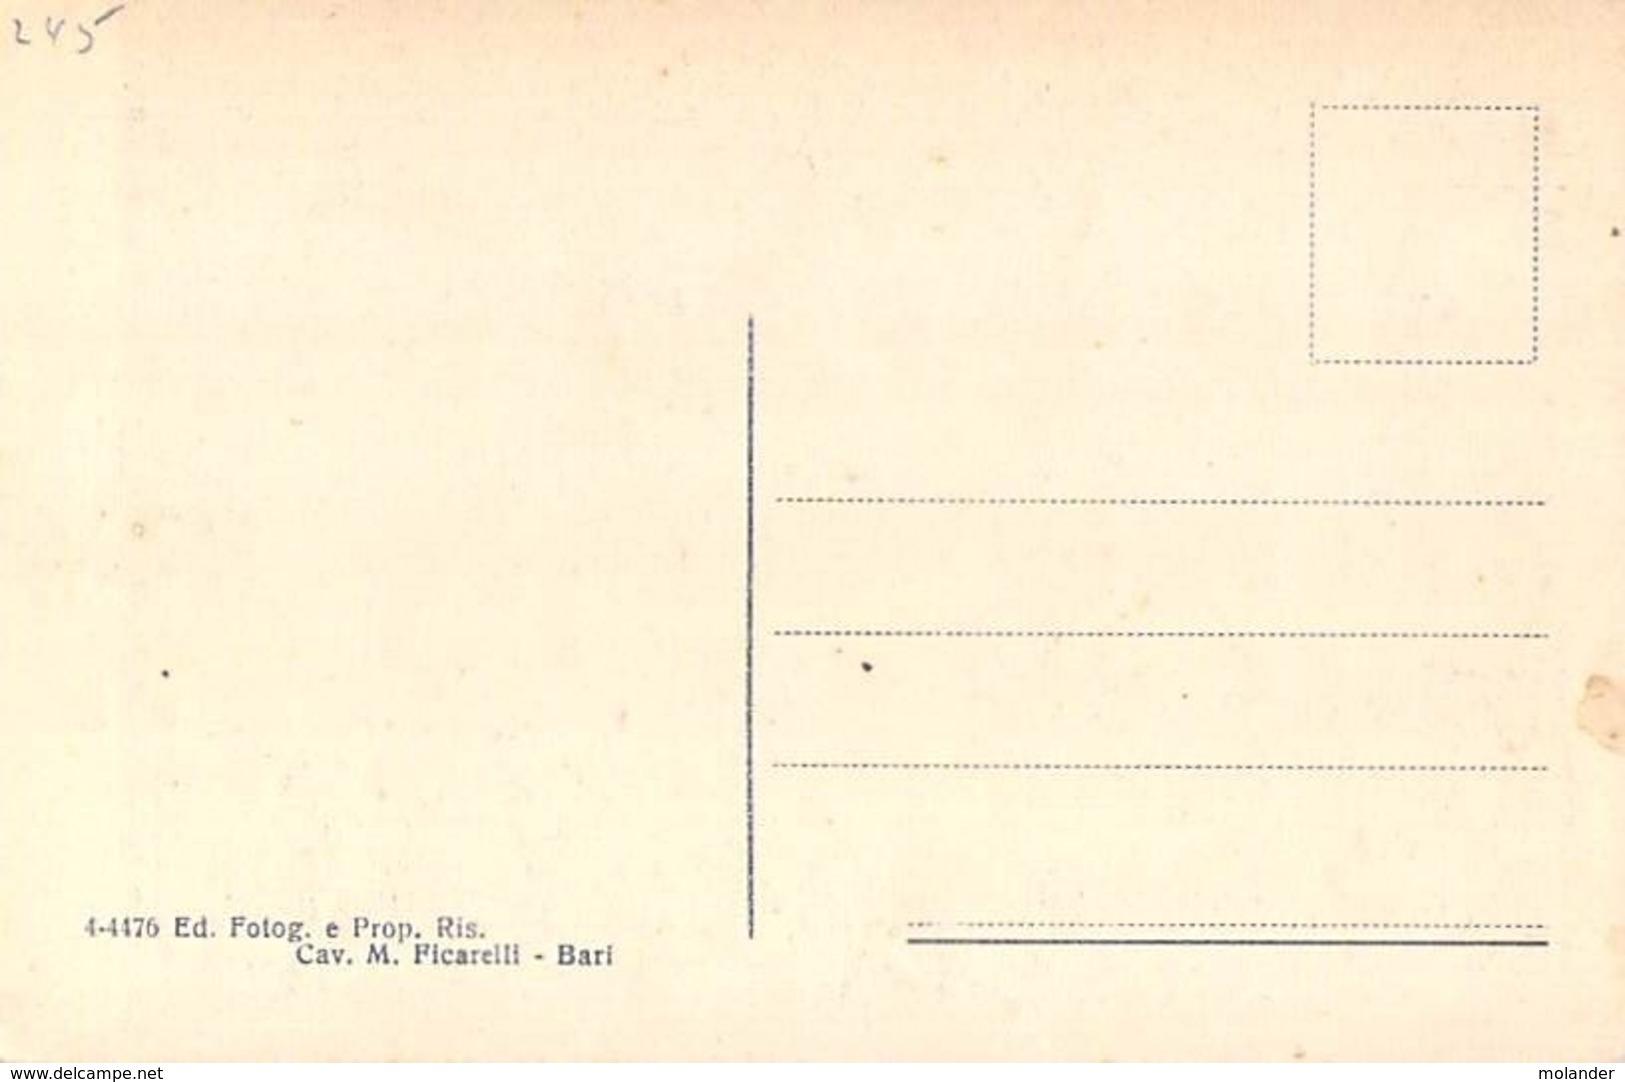 Bari -Bari Vechhia - Cortill S. Nicola Old Original Italia Postcard - Bari